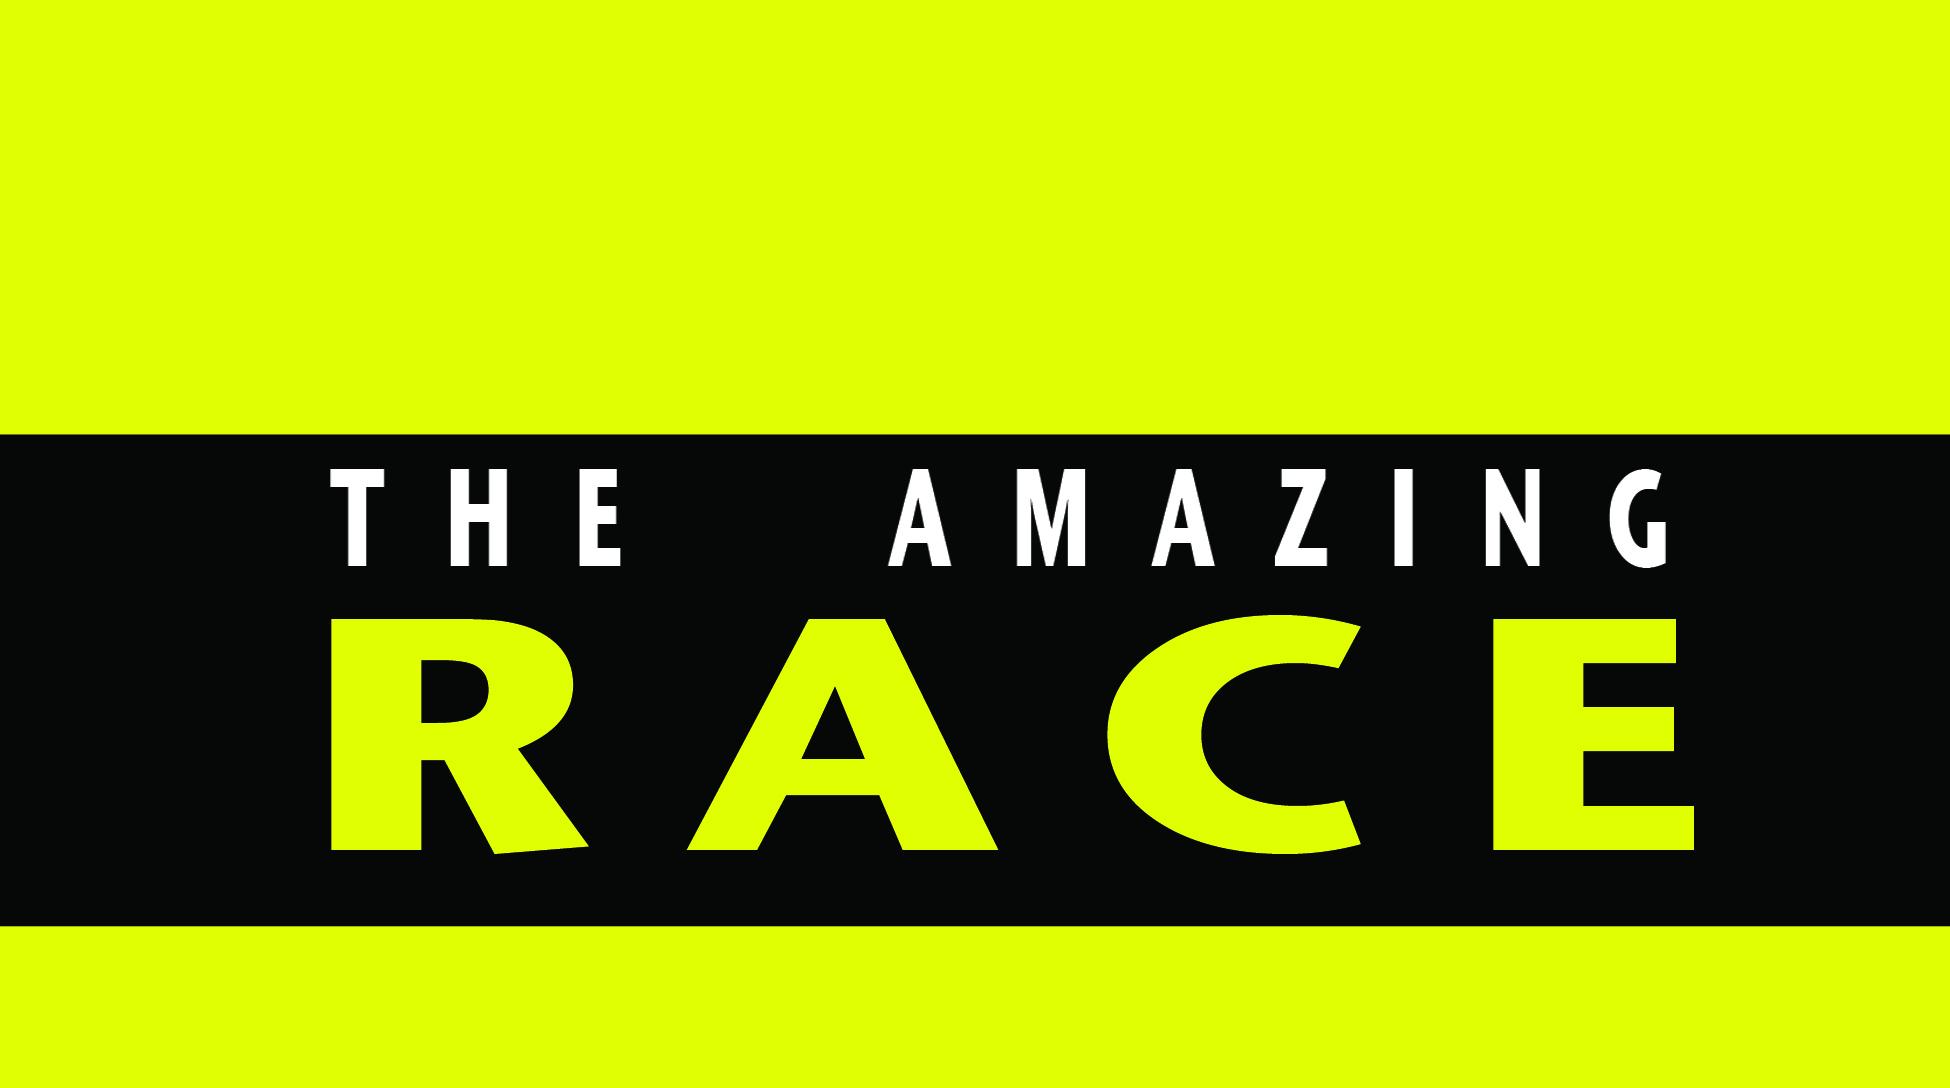 Race Car clipart amazing race Wallpapers · 3D Photos Graphics